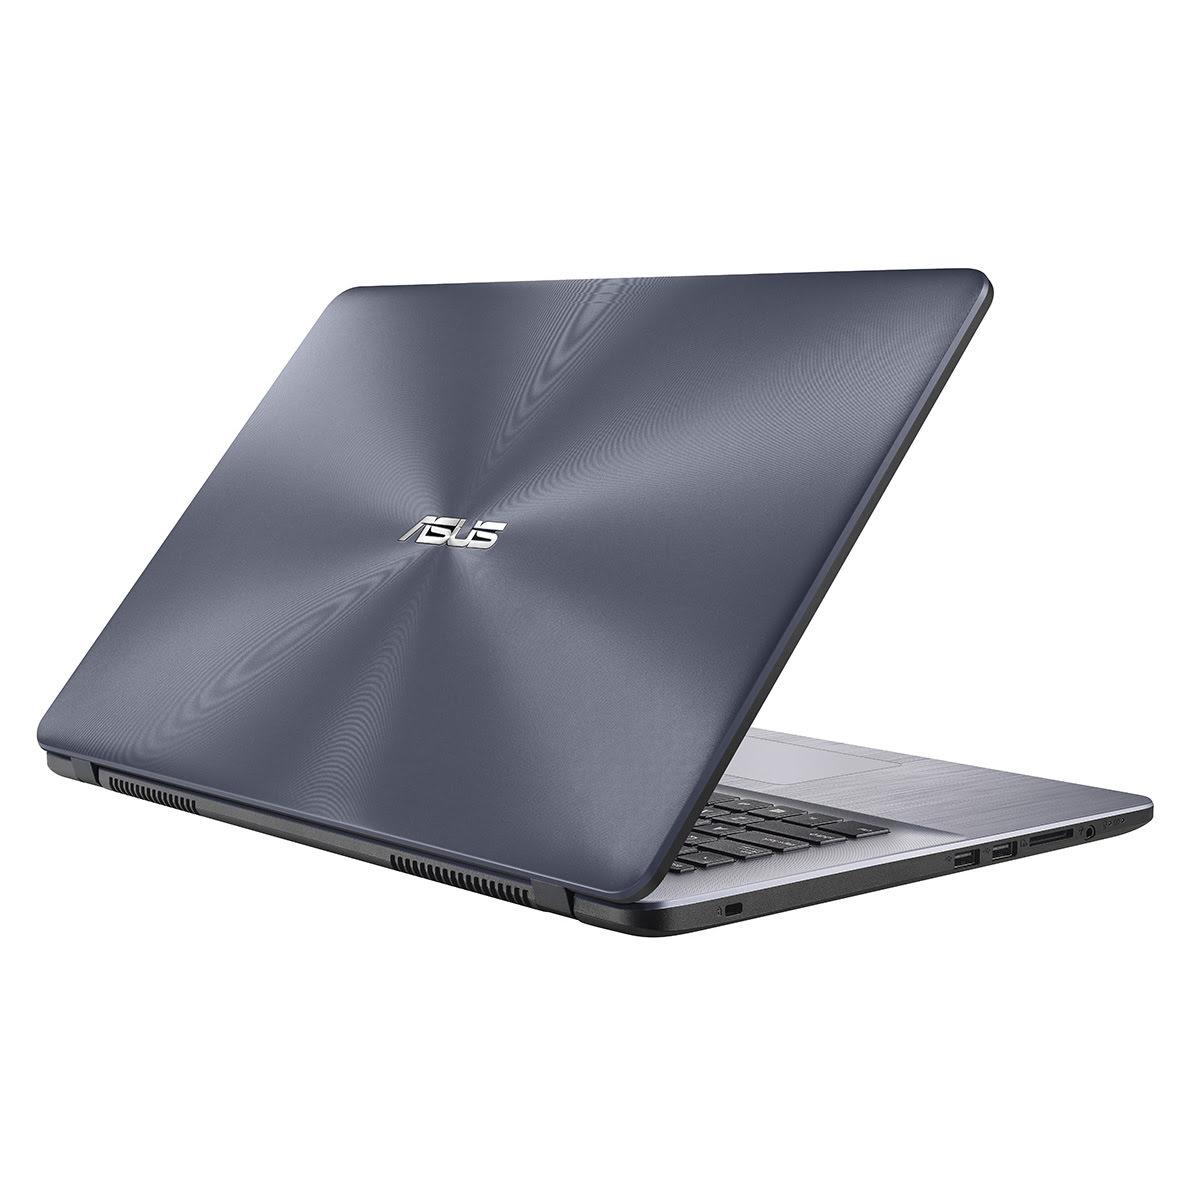 Asus 90NB0IE1-M01500 - PC portable Asus - Cybertek.fr - 4